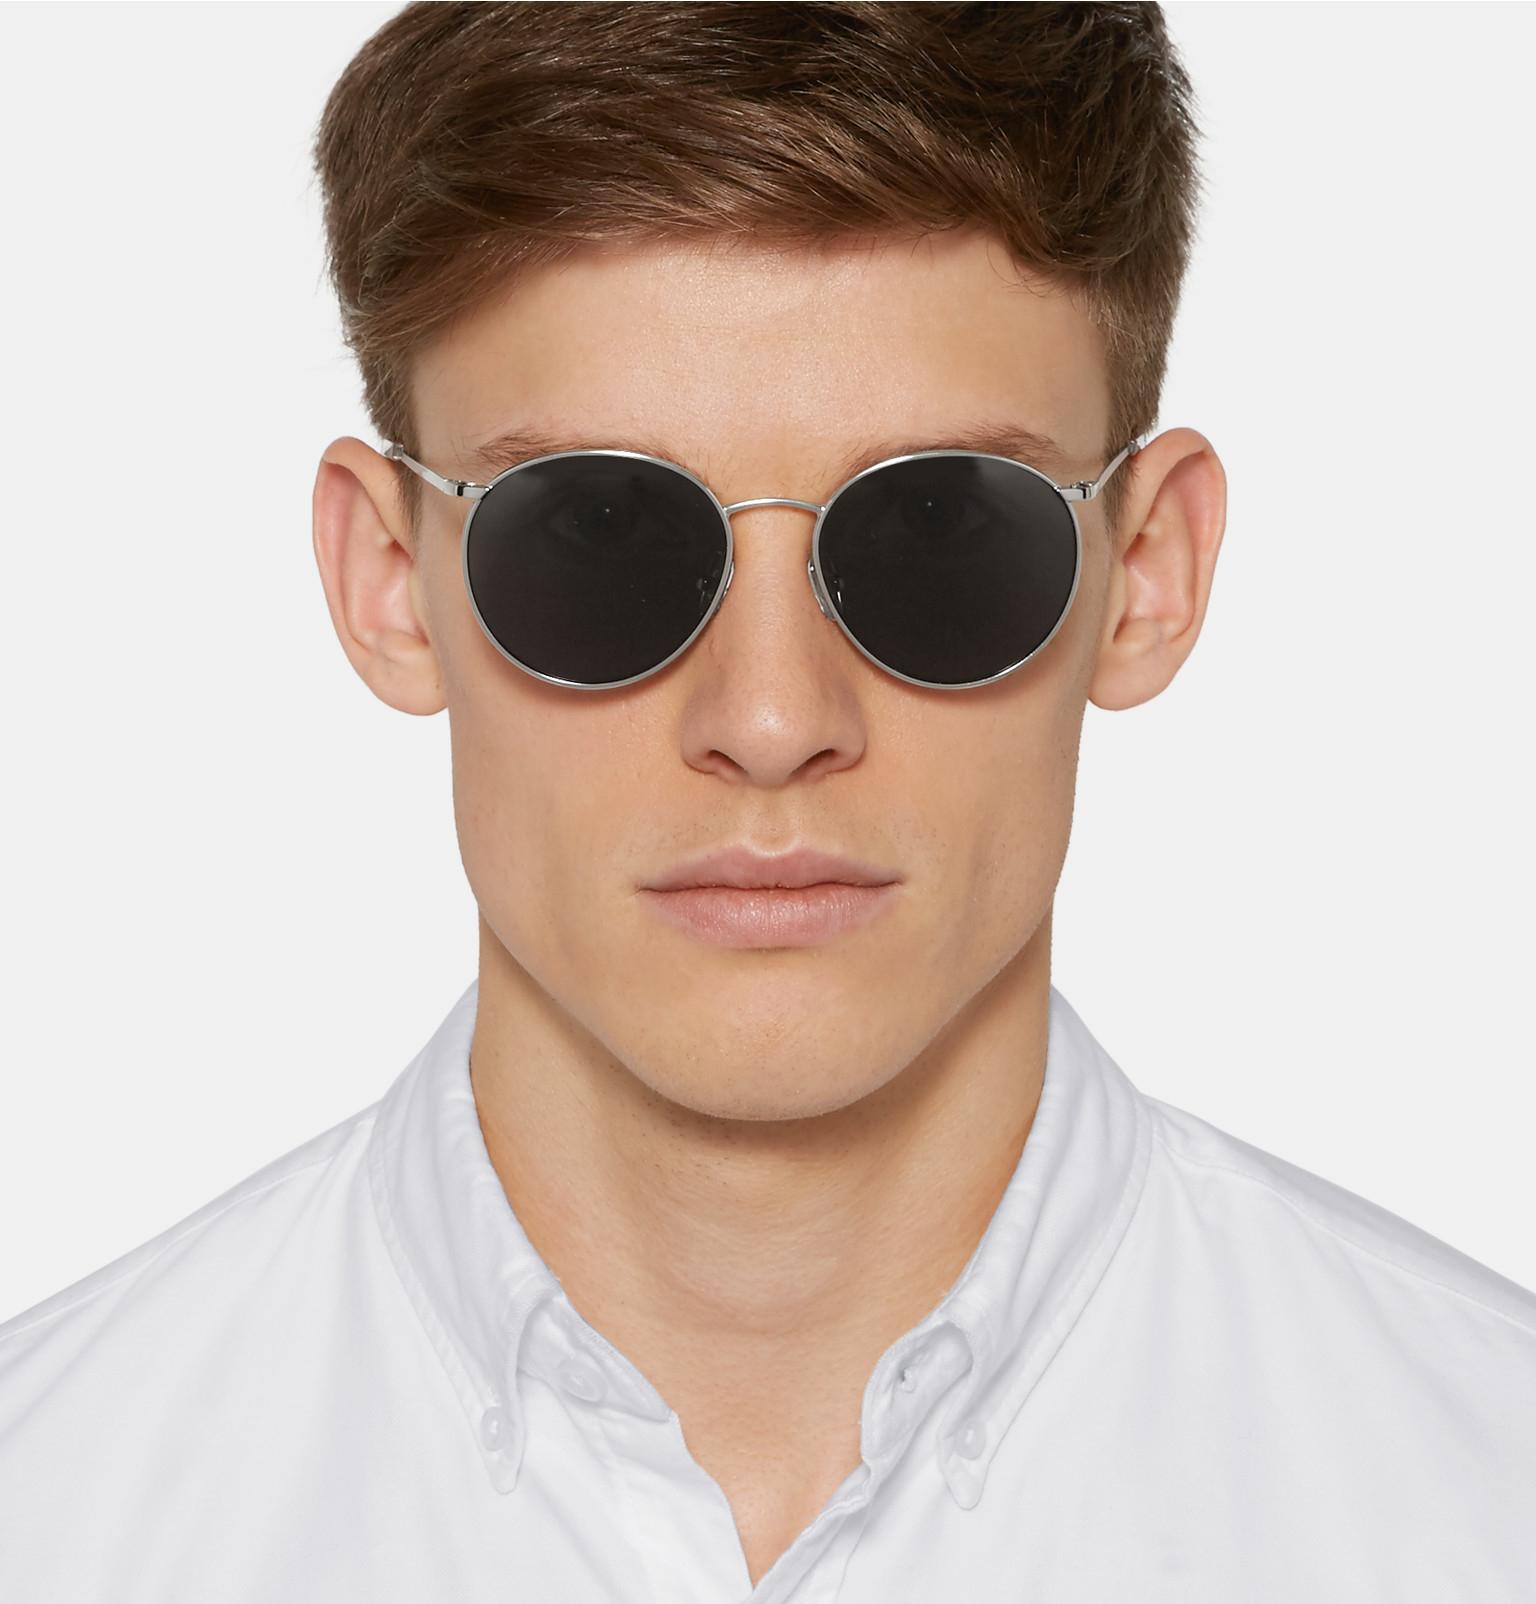 c21da96bb83 Dries Van Noten Round-frame Silver-tone Sunglasses in Metallic for ...